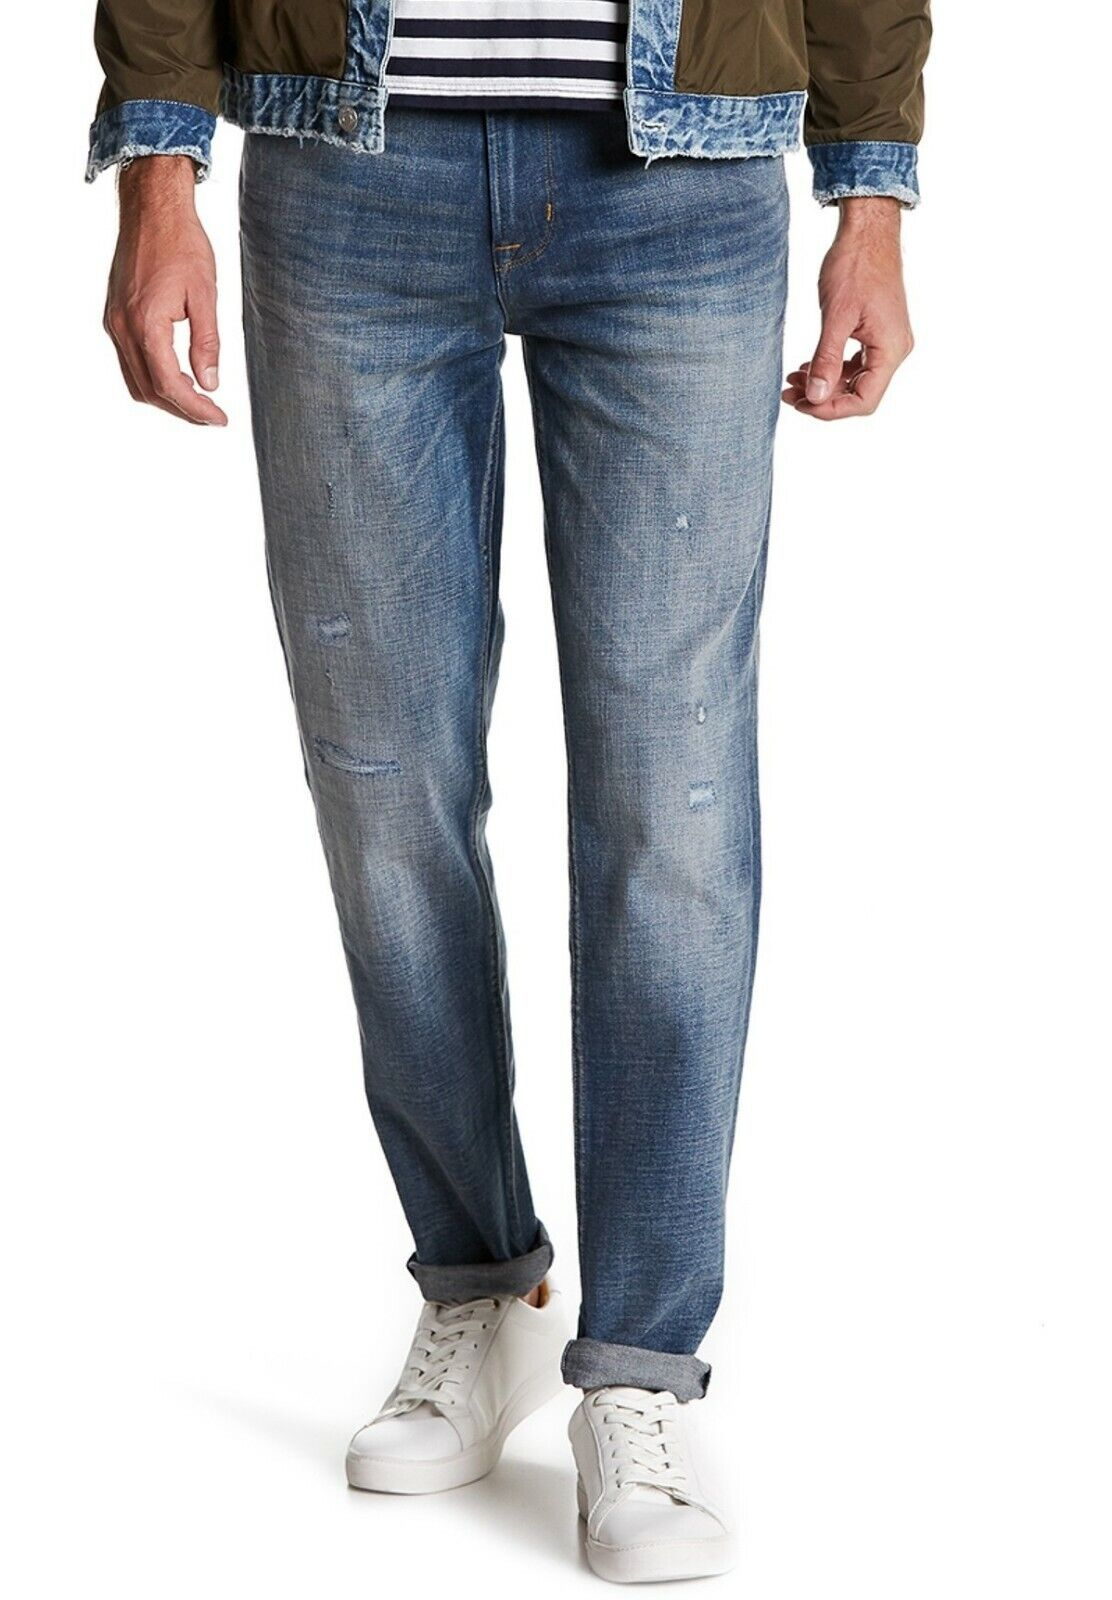 Hudson Jeans Men's Sartor Relaxed Skinny Leg Jeans Distressed Denim Laughlin